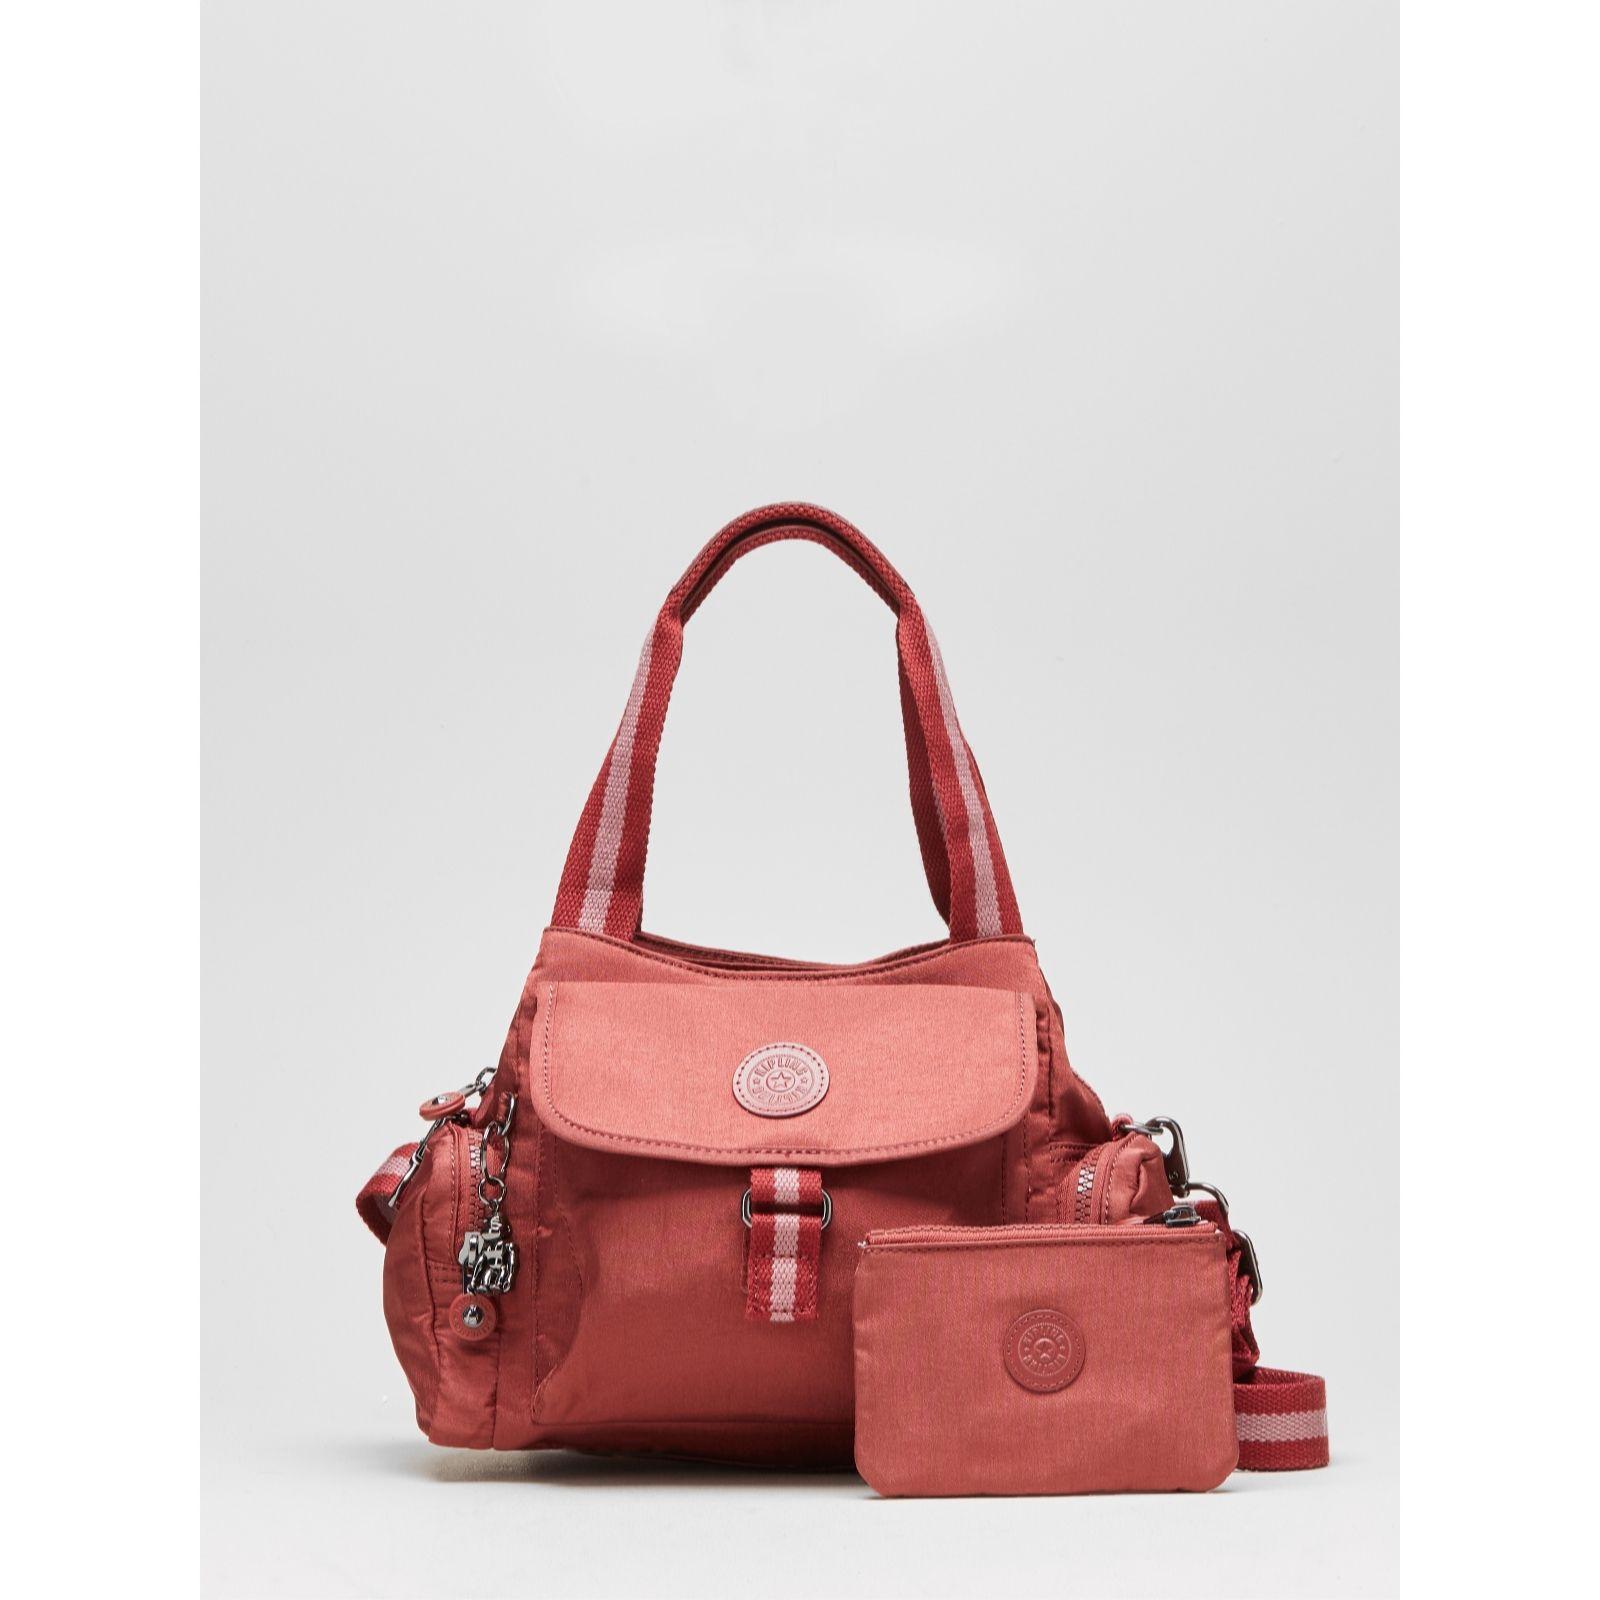 8516cc476d5 Kipling Fairfax Premium Handbag & Wallet Set - QVC UK